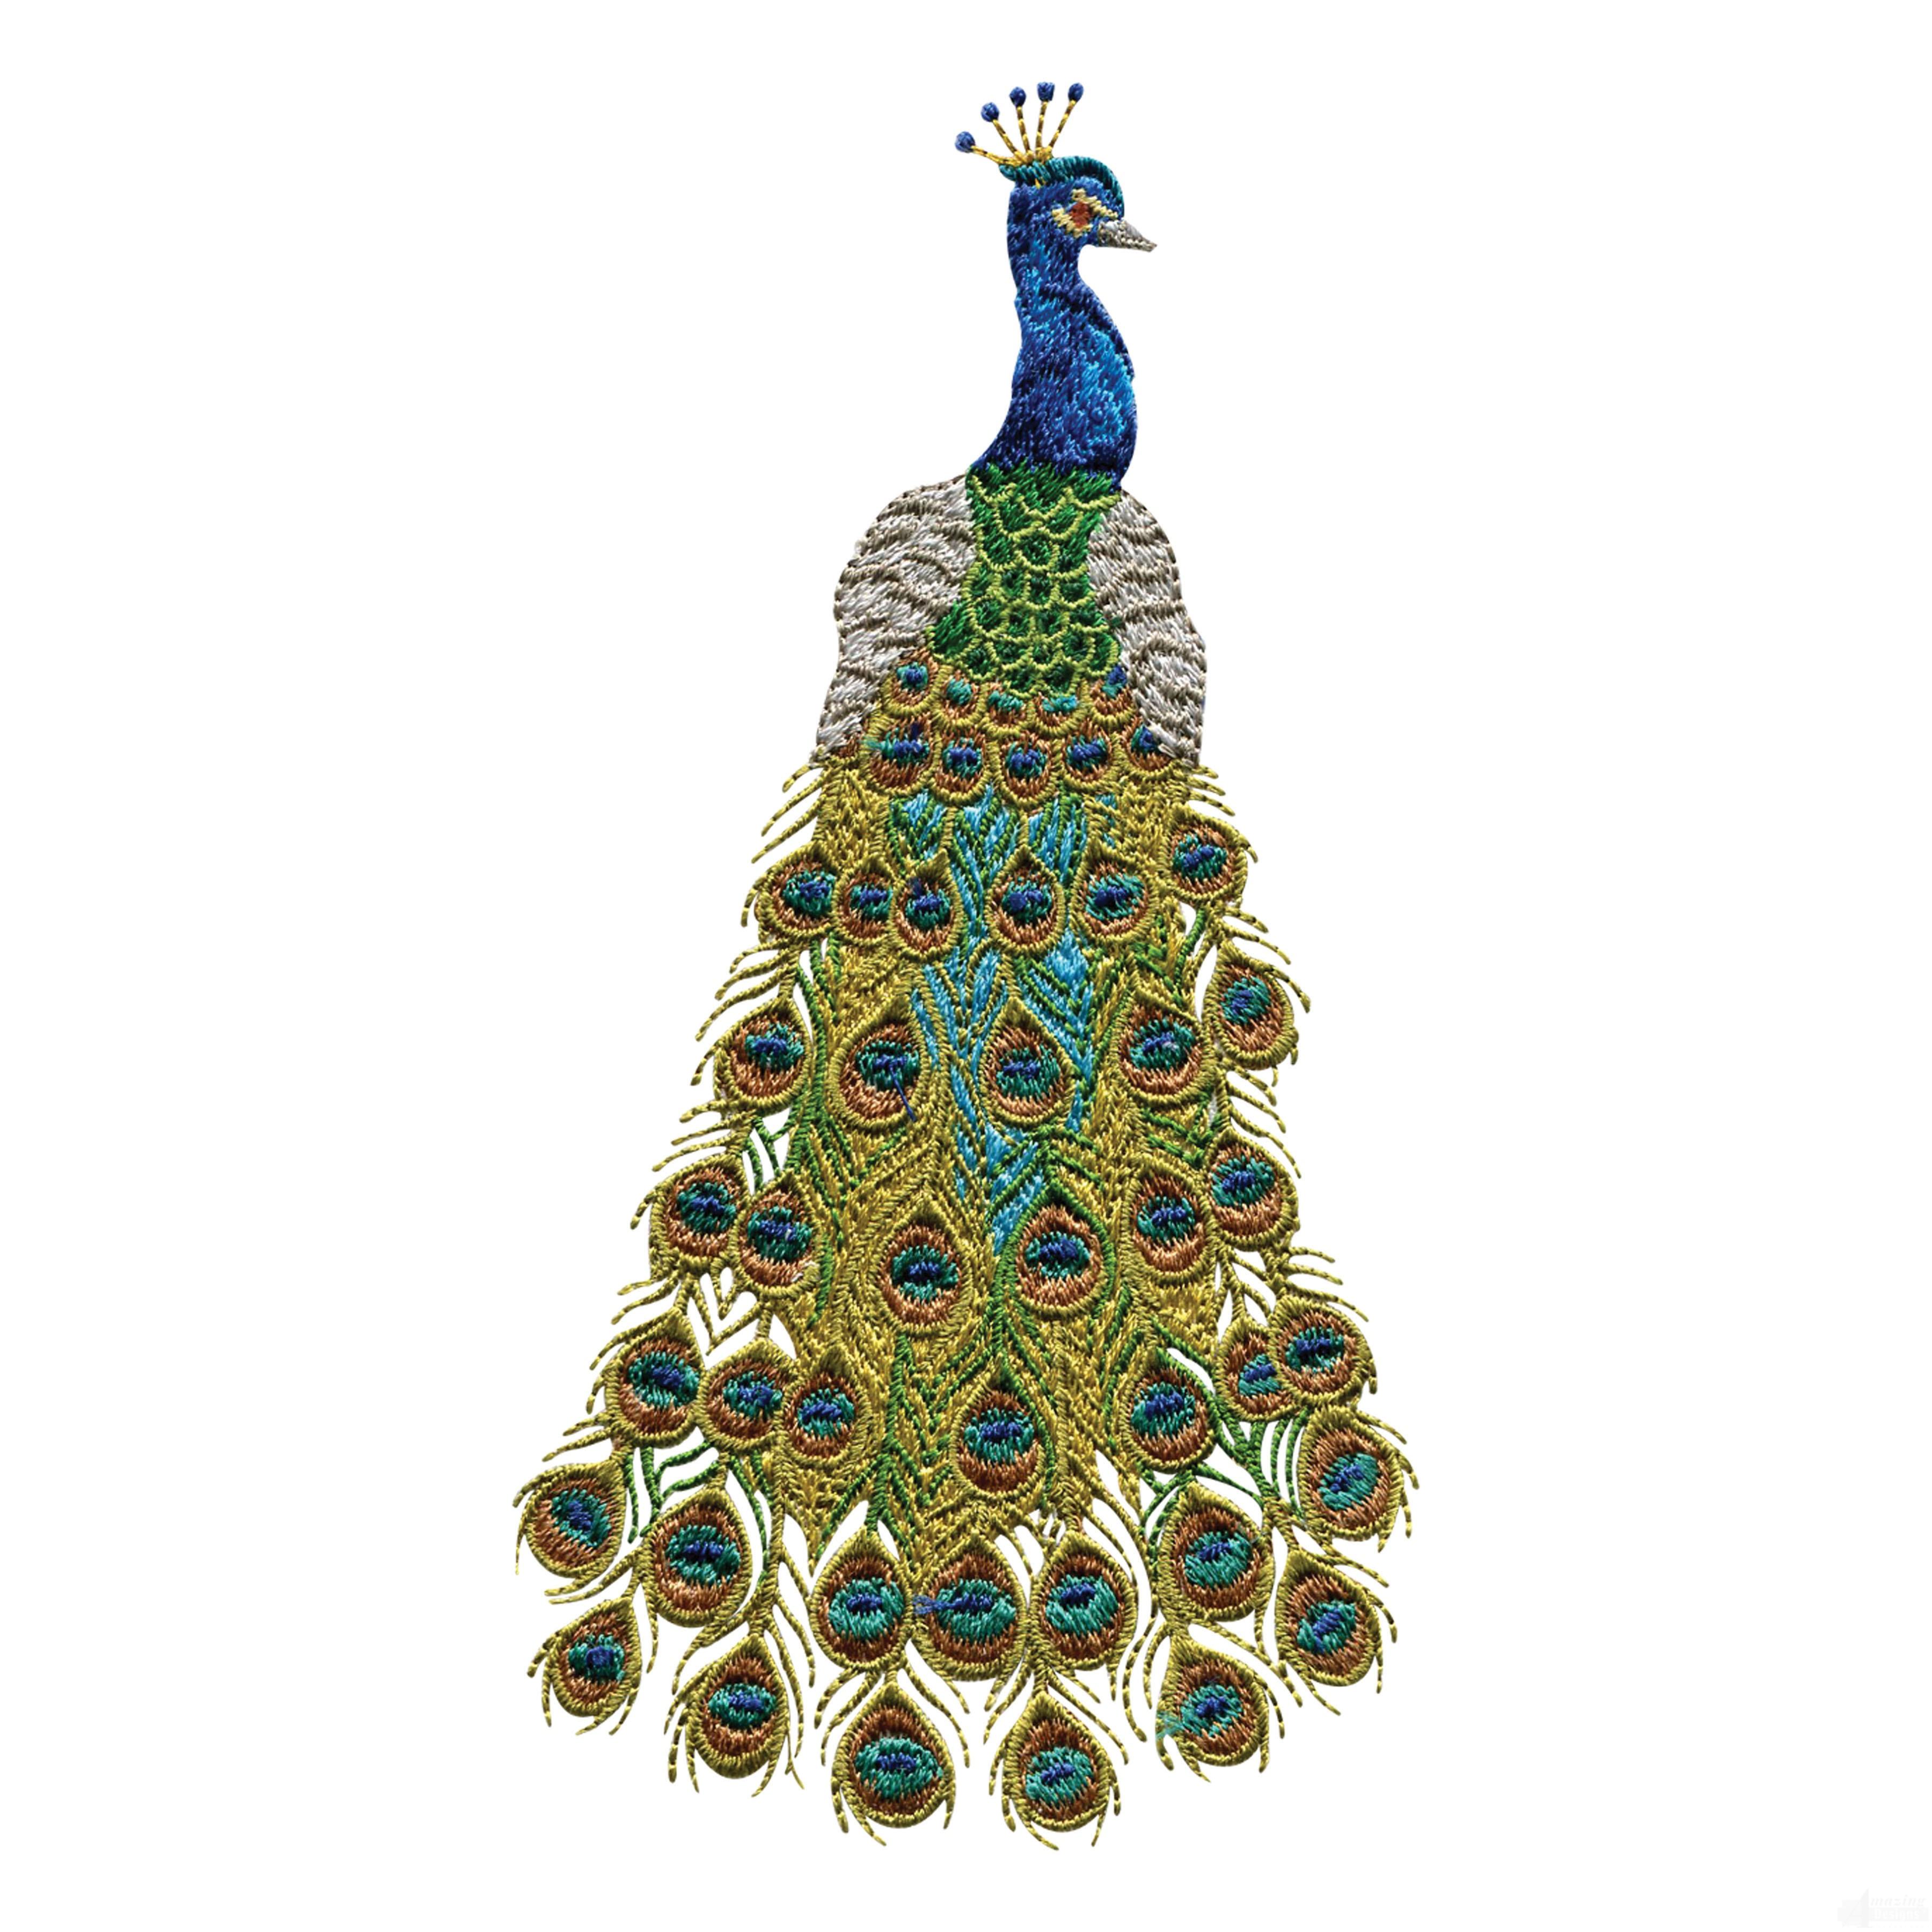 swnpa124 peacock embroidery design